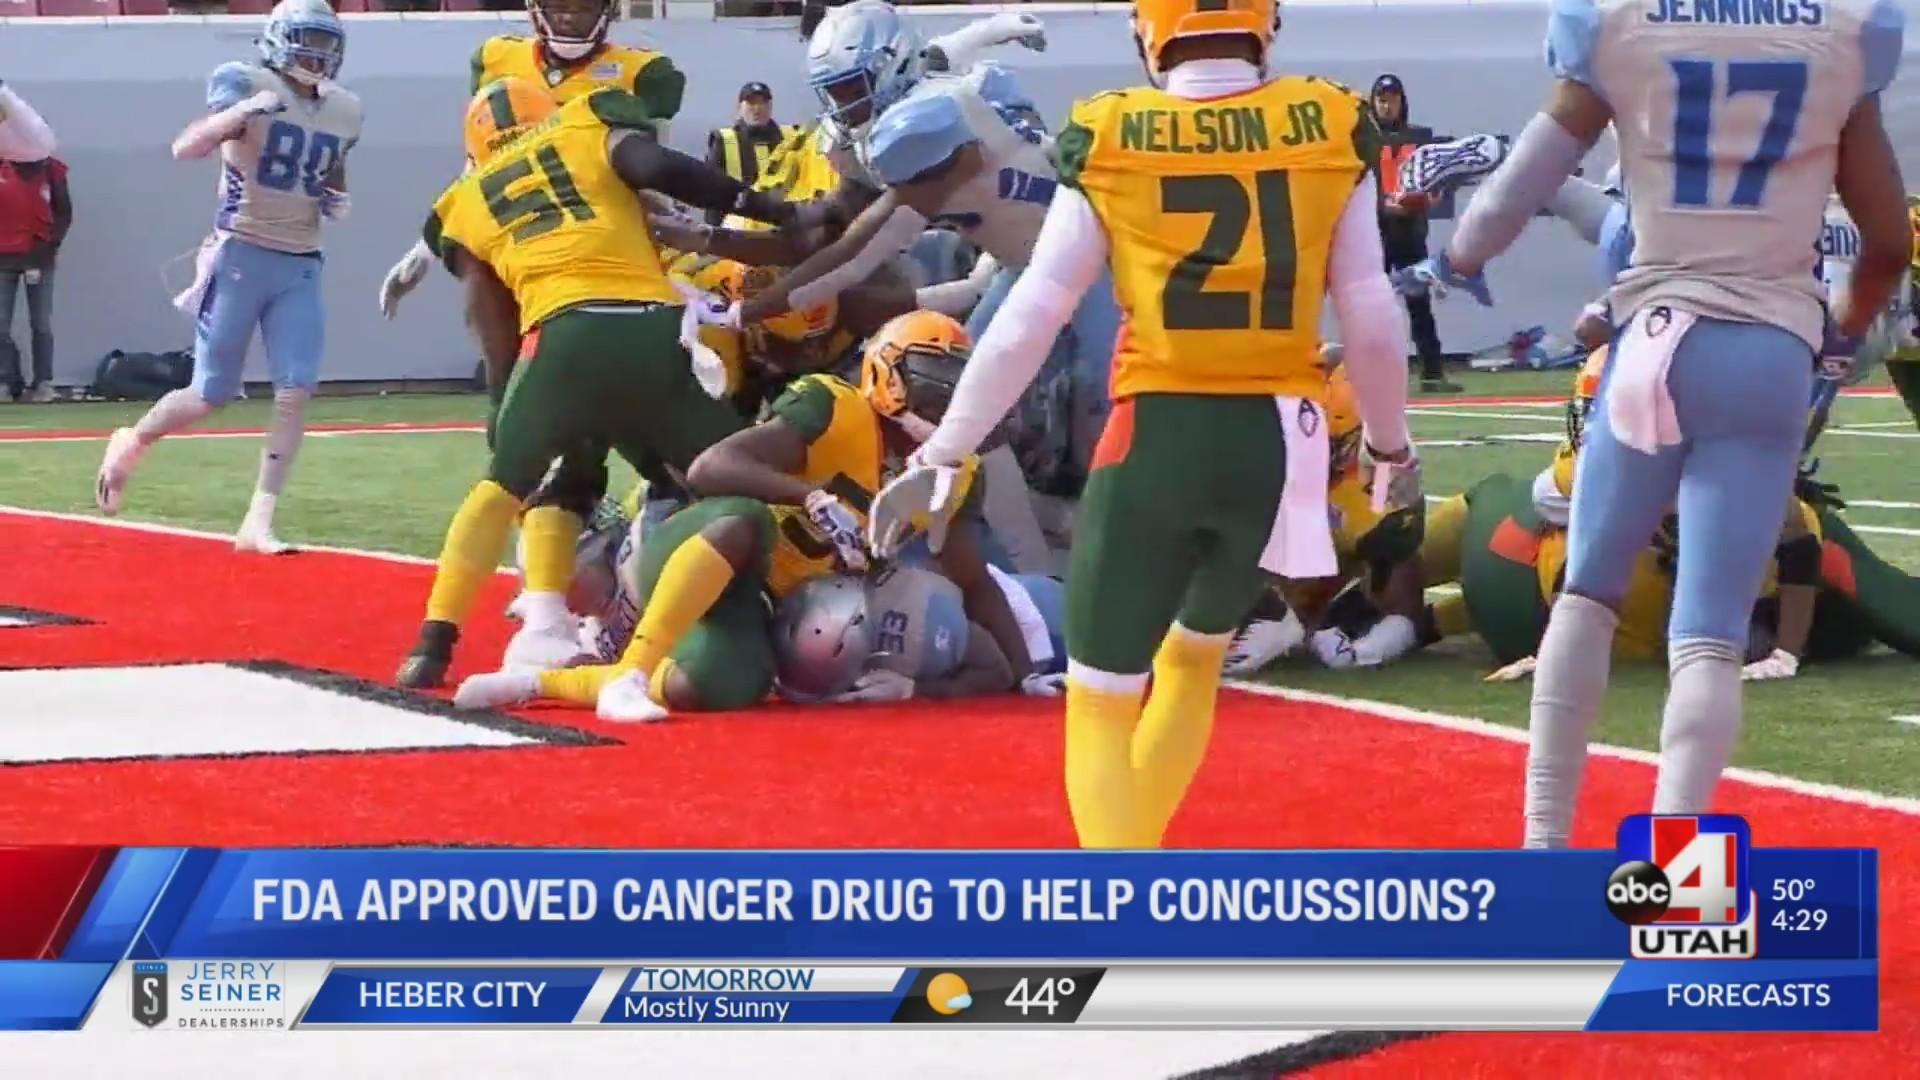 CANCER DRUG FOR CONCUSSION